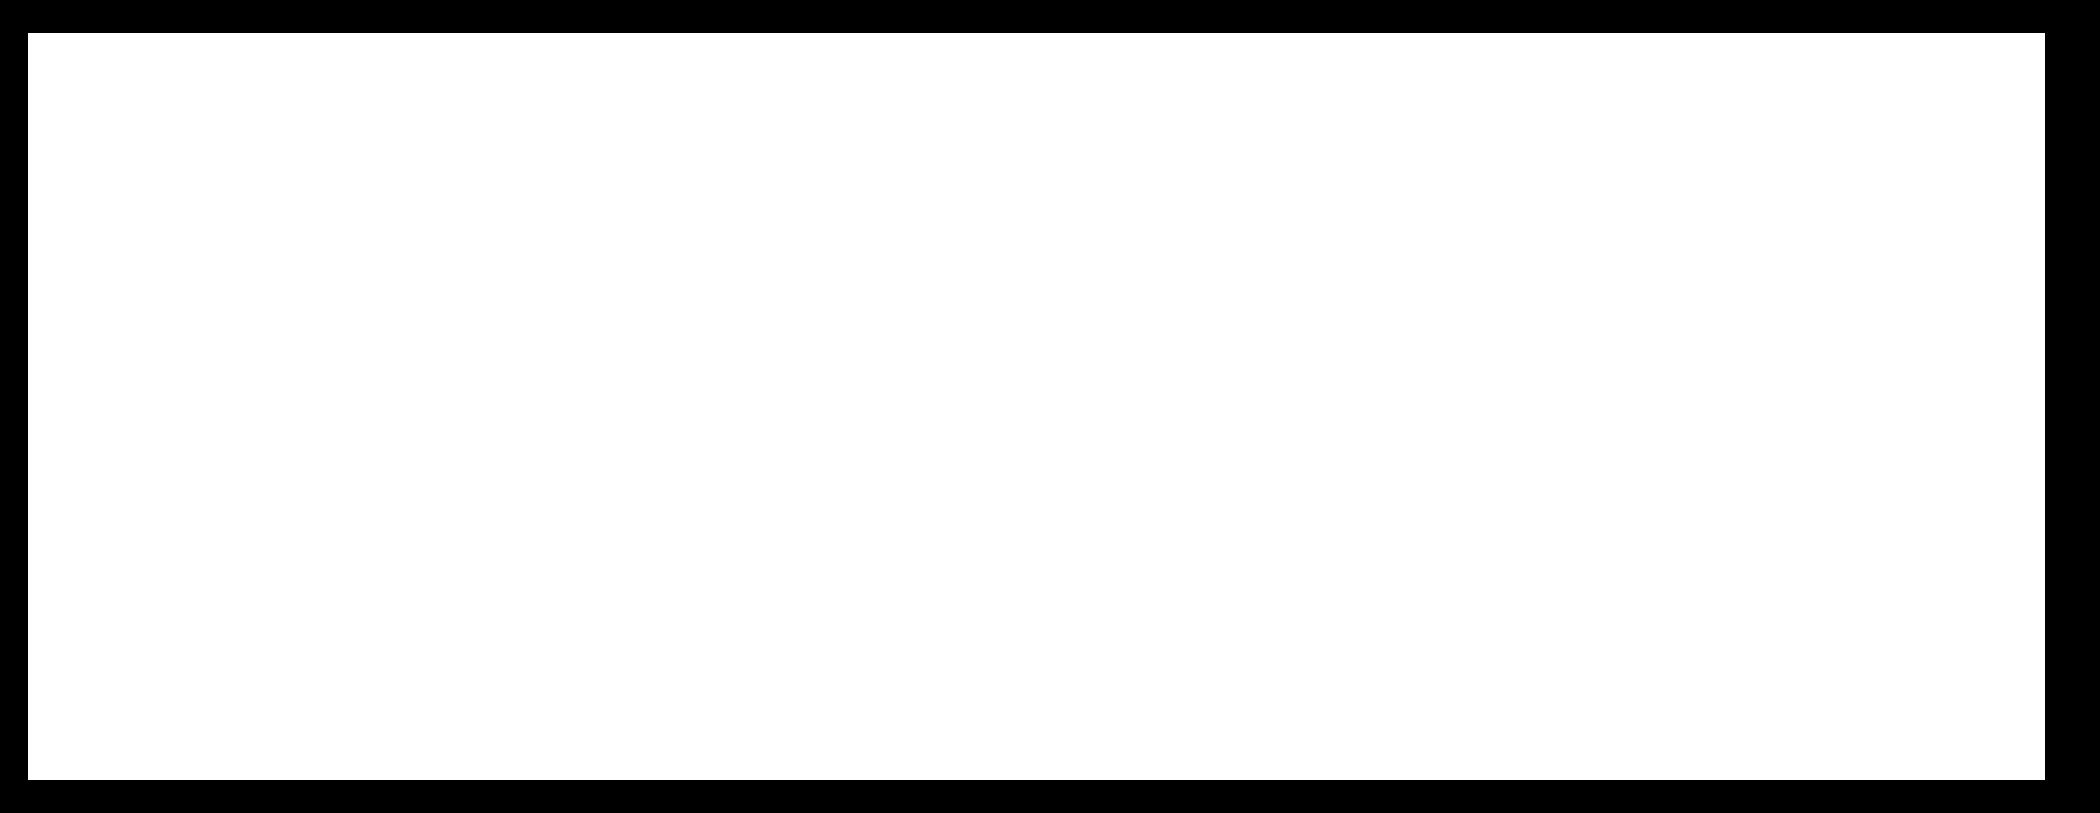 PASIC Artist Applications